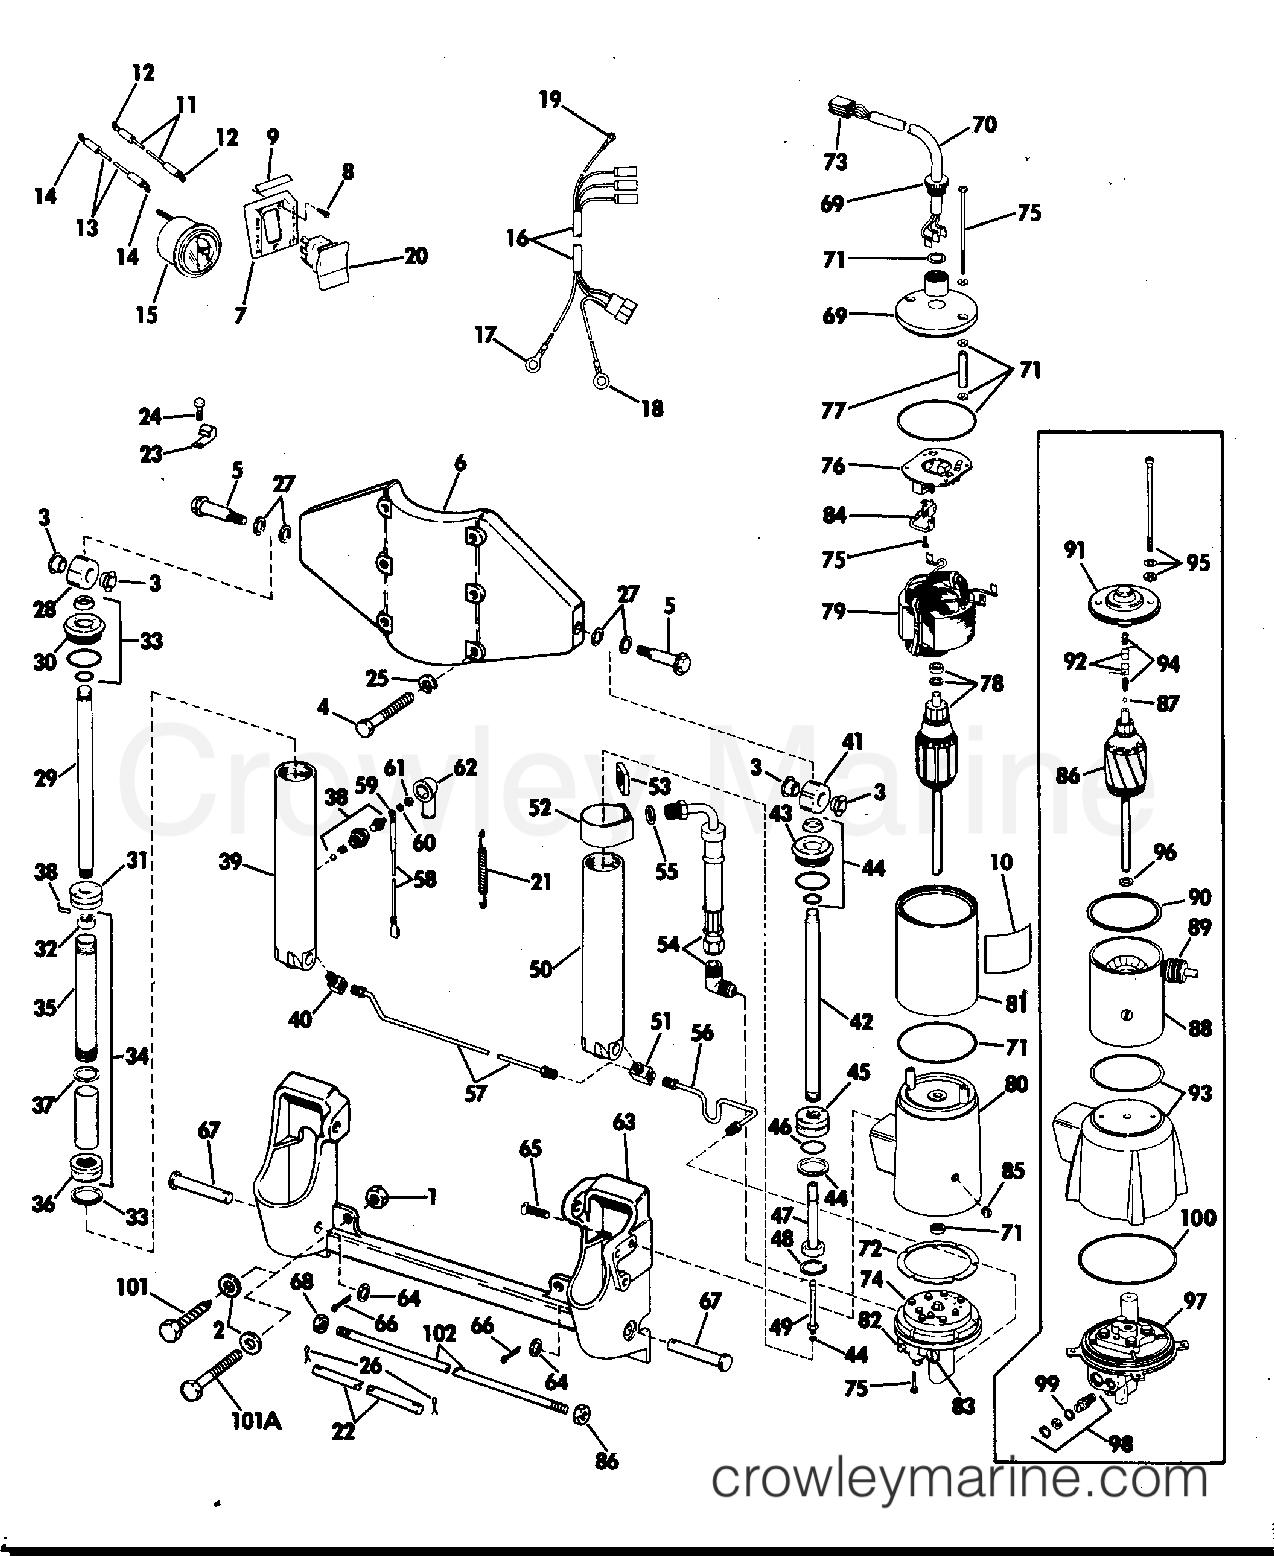 35741 zhxg1hom honda 70 wiring diagram at free freeautoresponder co